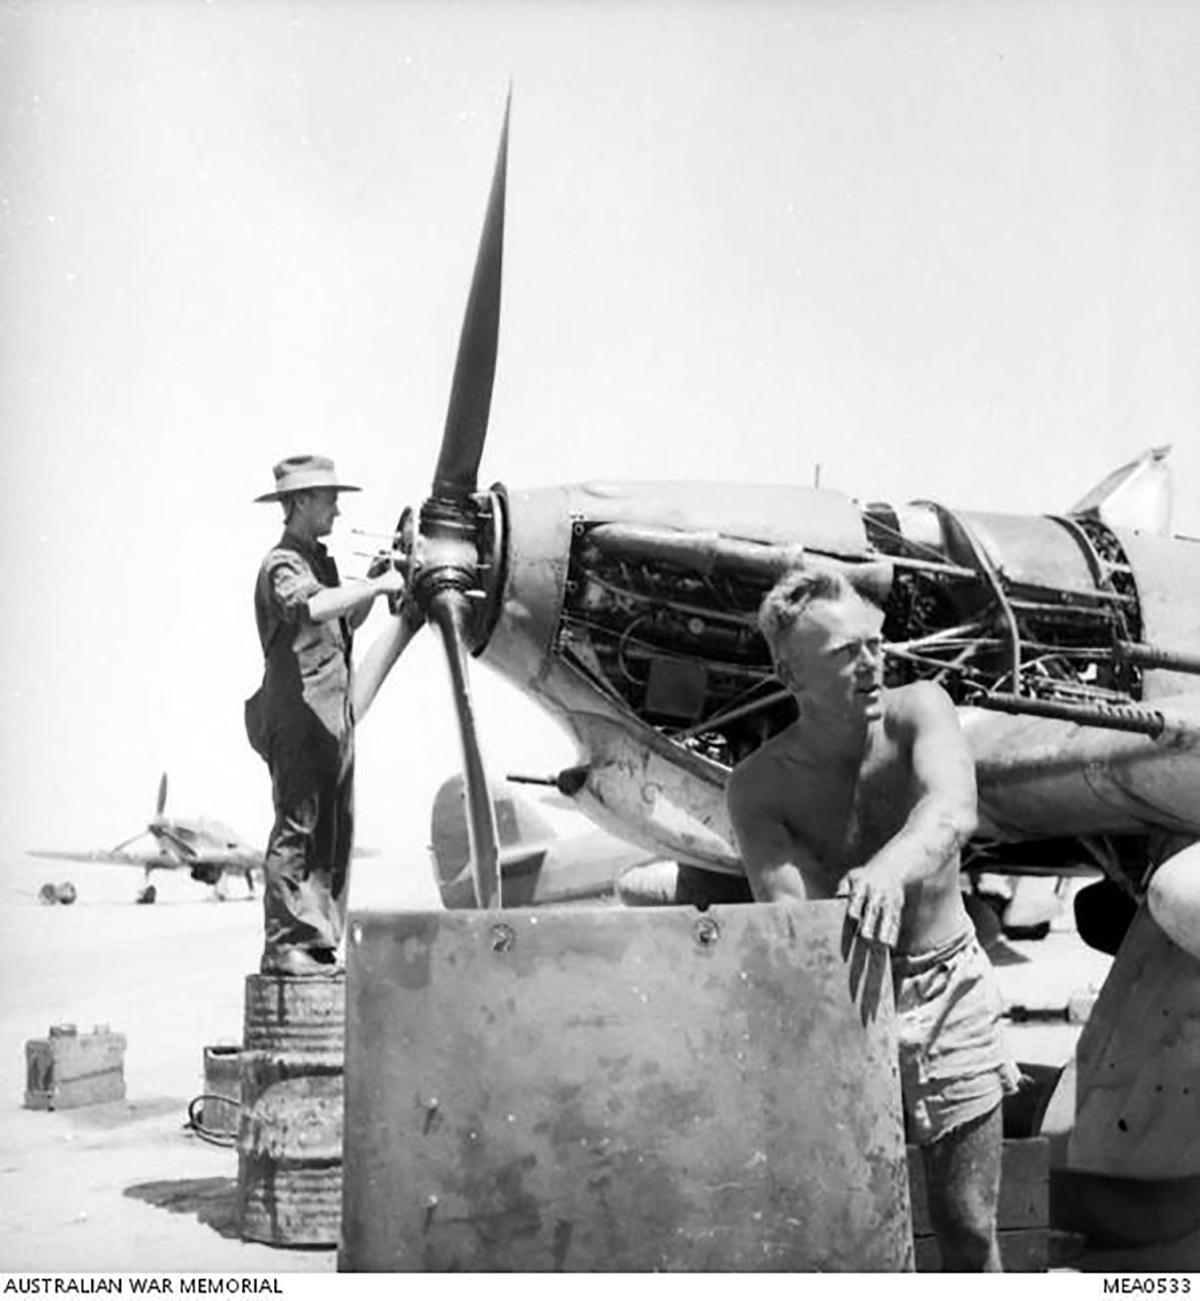 Hurricane IIc Trop RAAF 451Sqn propeller installation Egypt AWM 01